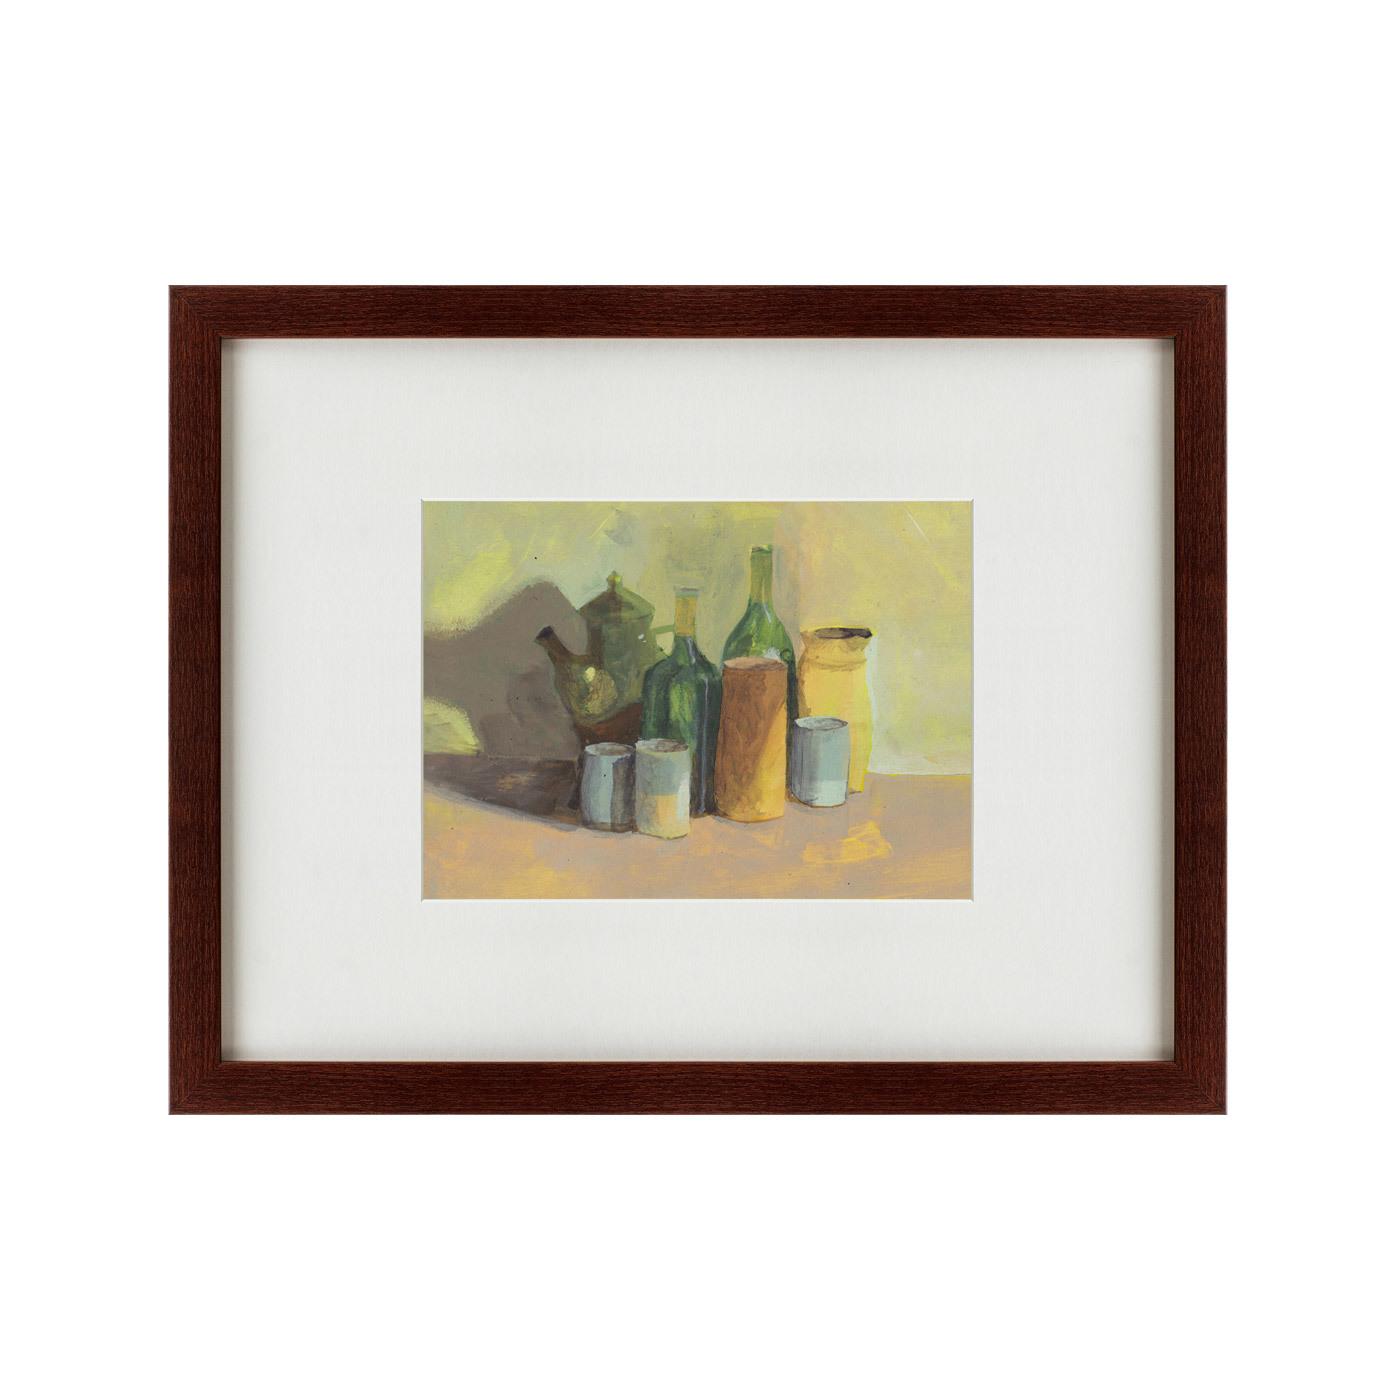 {} Картины в Квартиру Картина Peinture Poterie 5 (47х60 см) картины в квартиру картина introducing the miracle 47х60 см